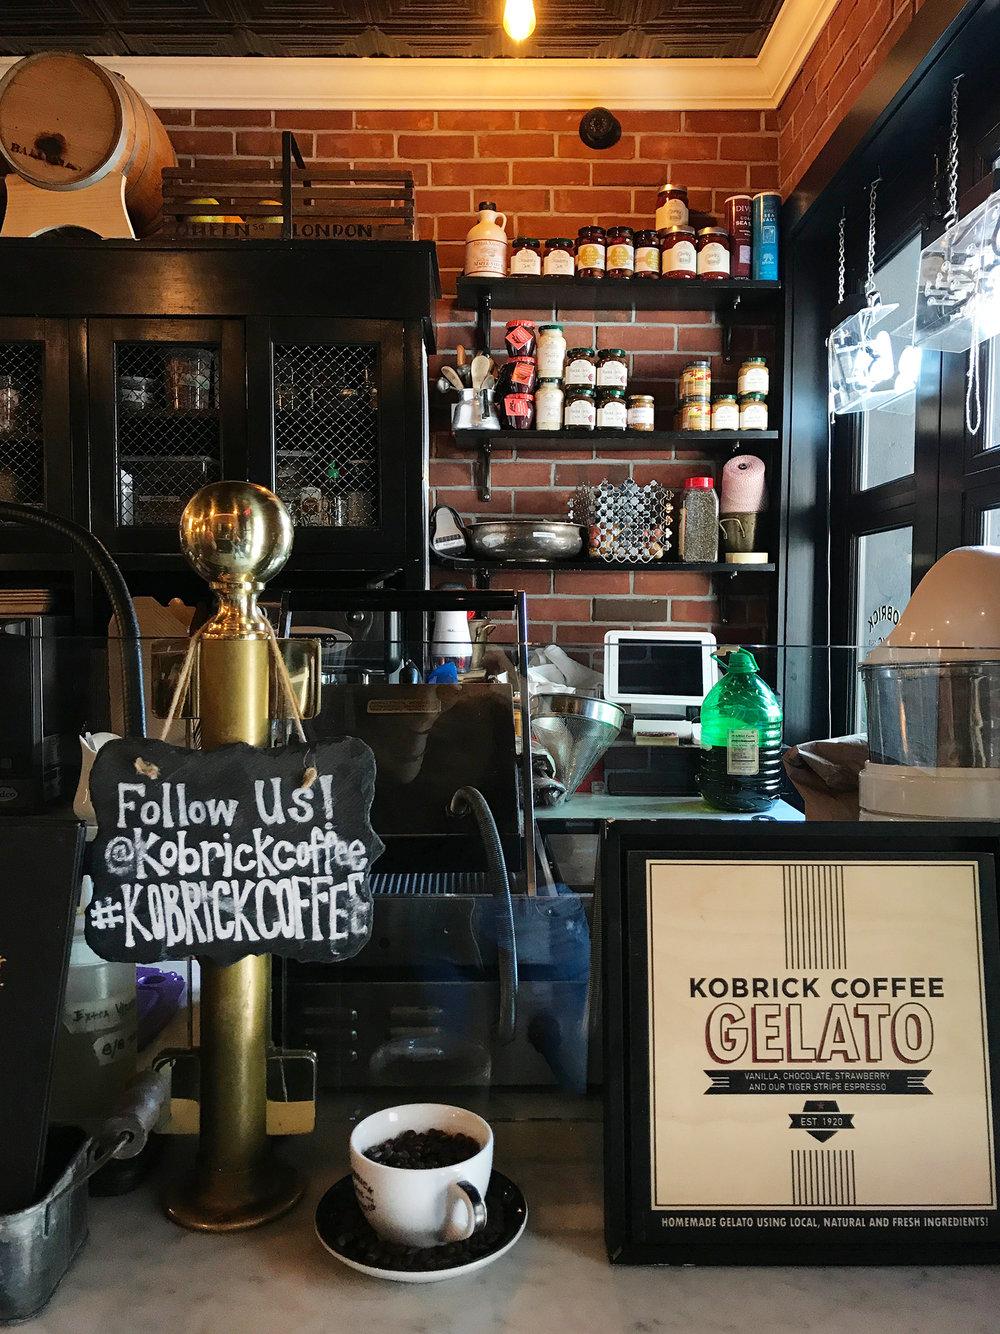 Kobrick Coffee